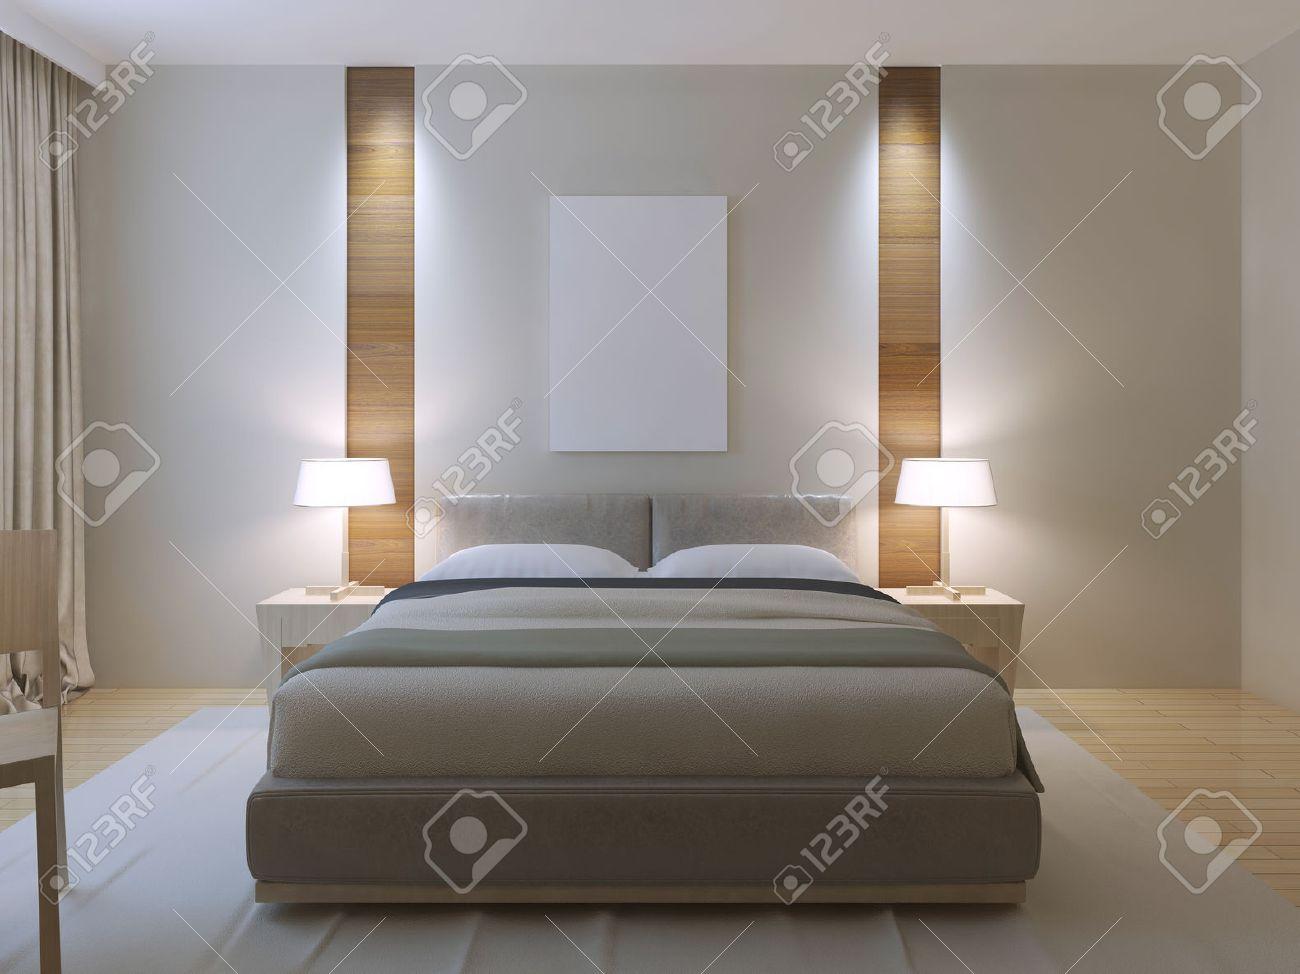 Diseno Moderno Dormitorio Principal Cama Doble Vestida Con Cabecero - Dormitorio-diseo-moderno